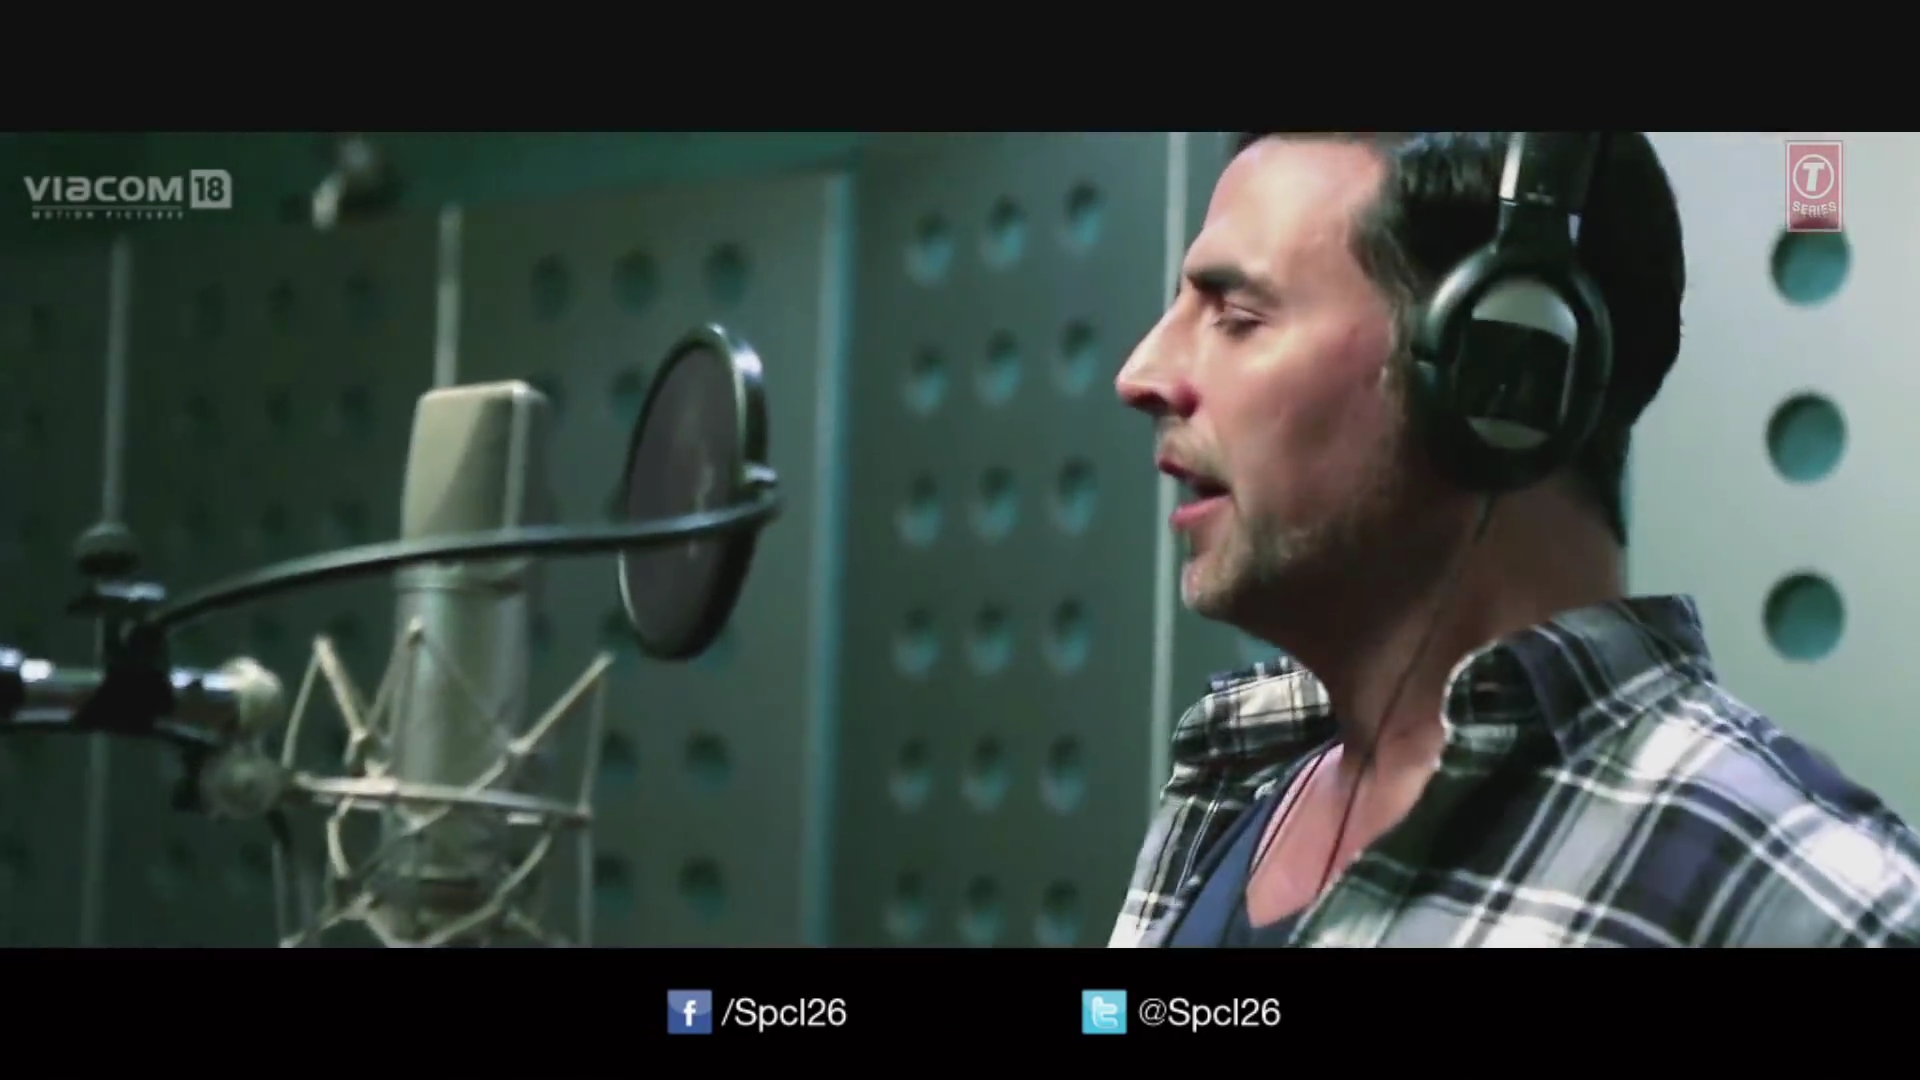 z_2013 - Special Chabbis - Mujh Mein Tu ft. Akshay Kumar_1080p.mp46547.jpg